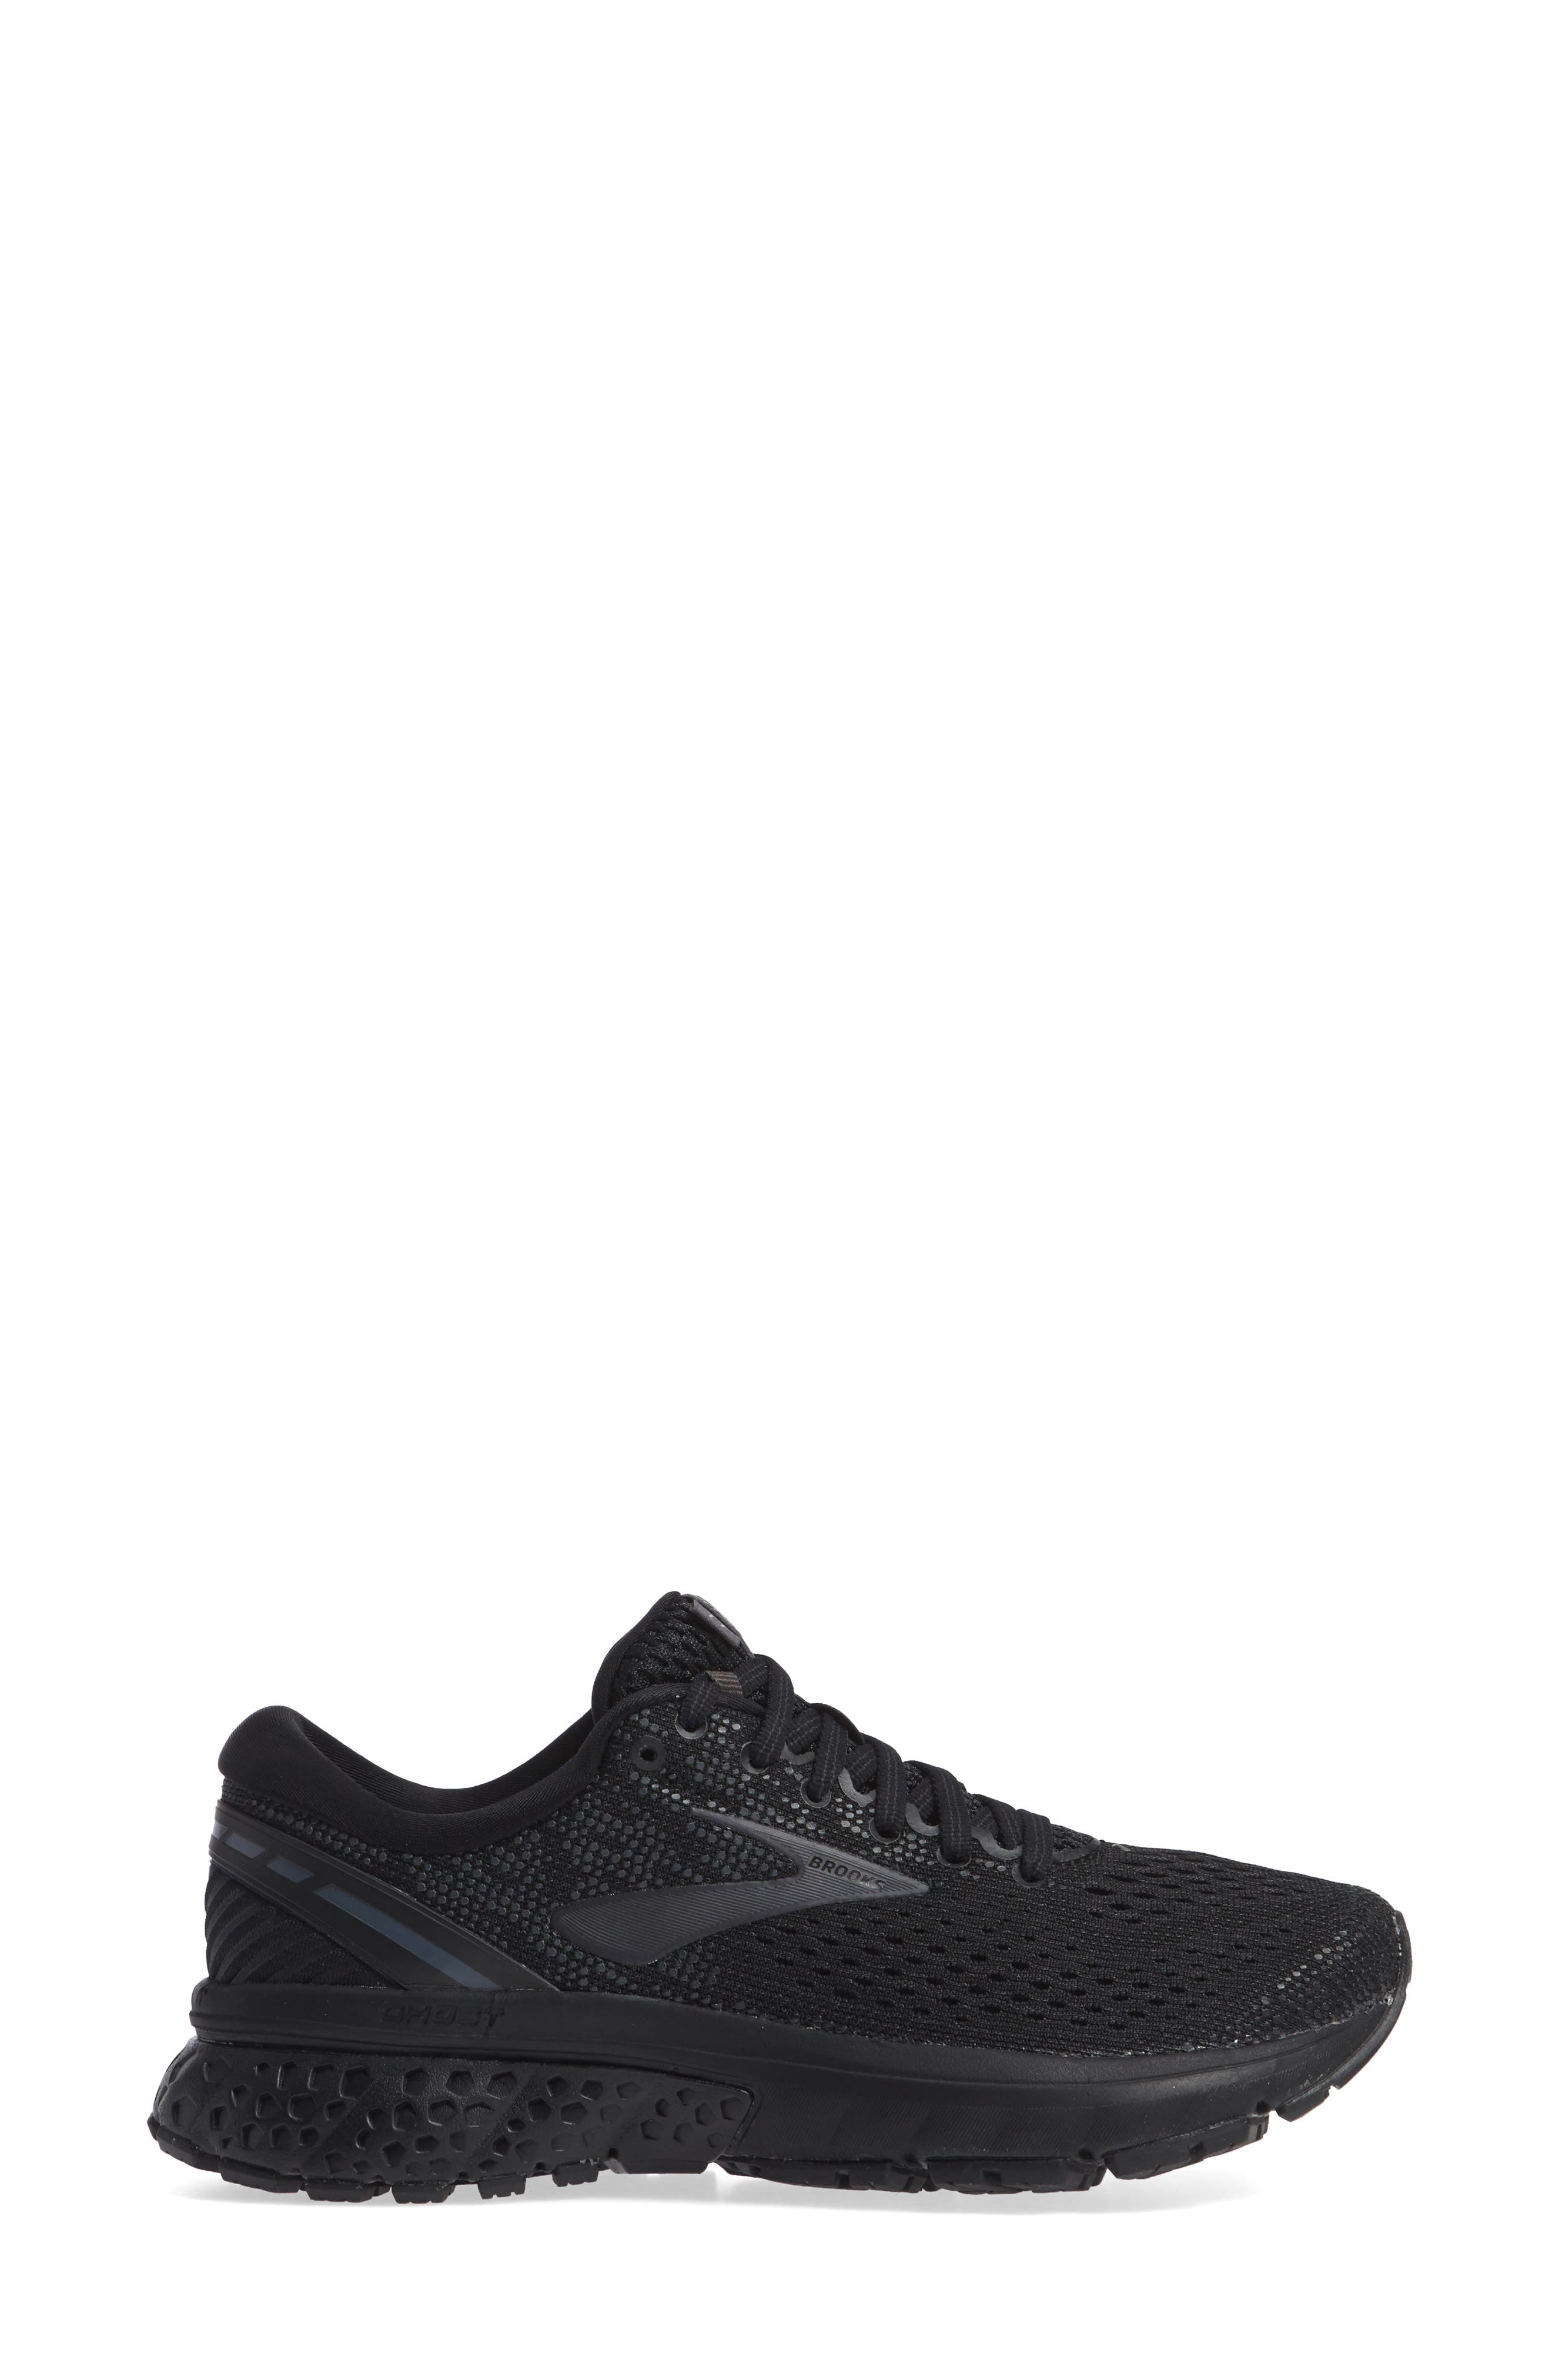 Ghost 11 Running Shoe,                             Alternate thumbnail 3, color,                             BLACK/ EBONY